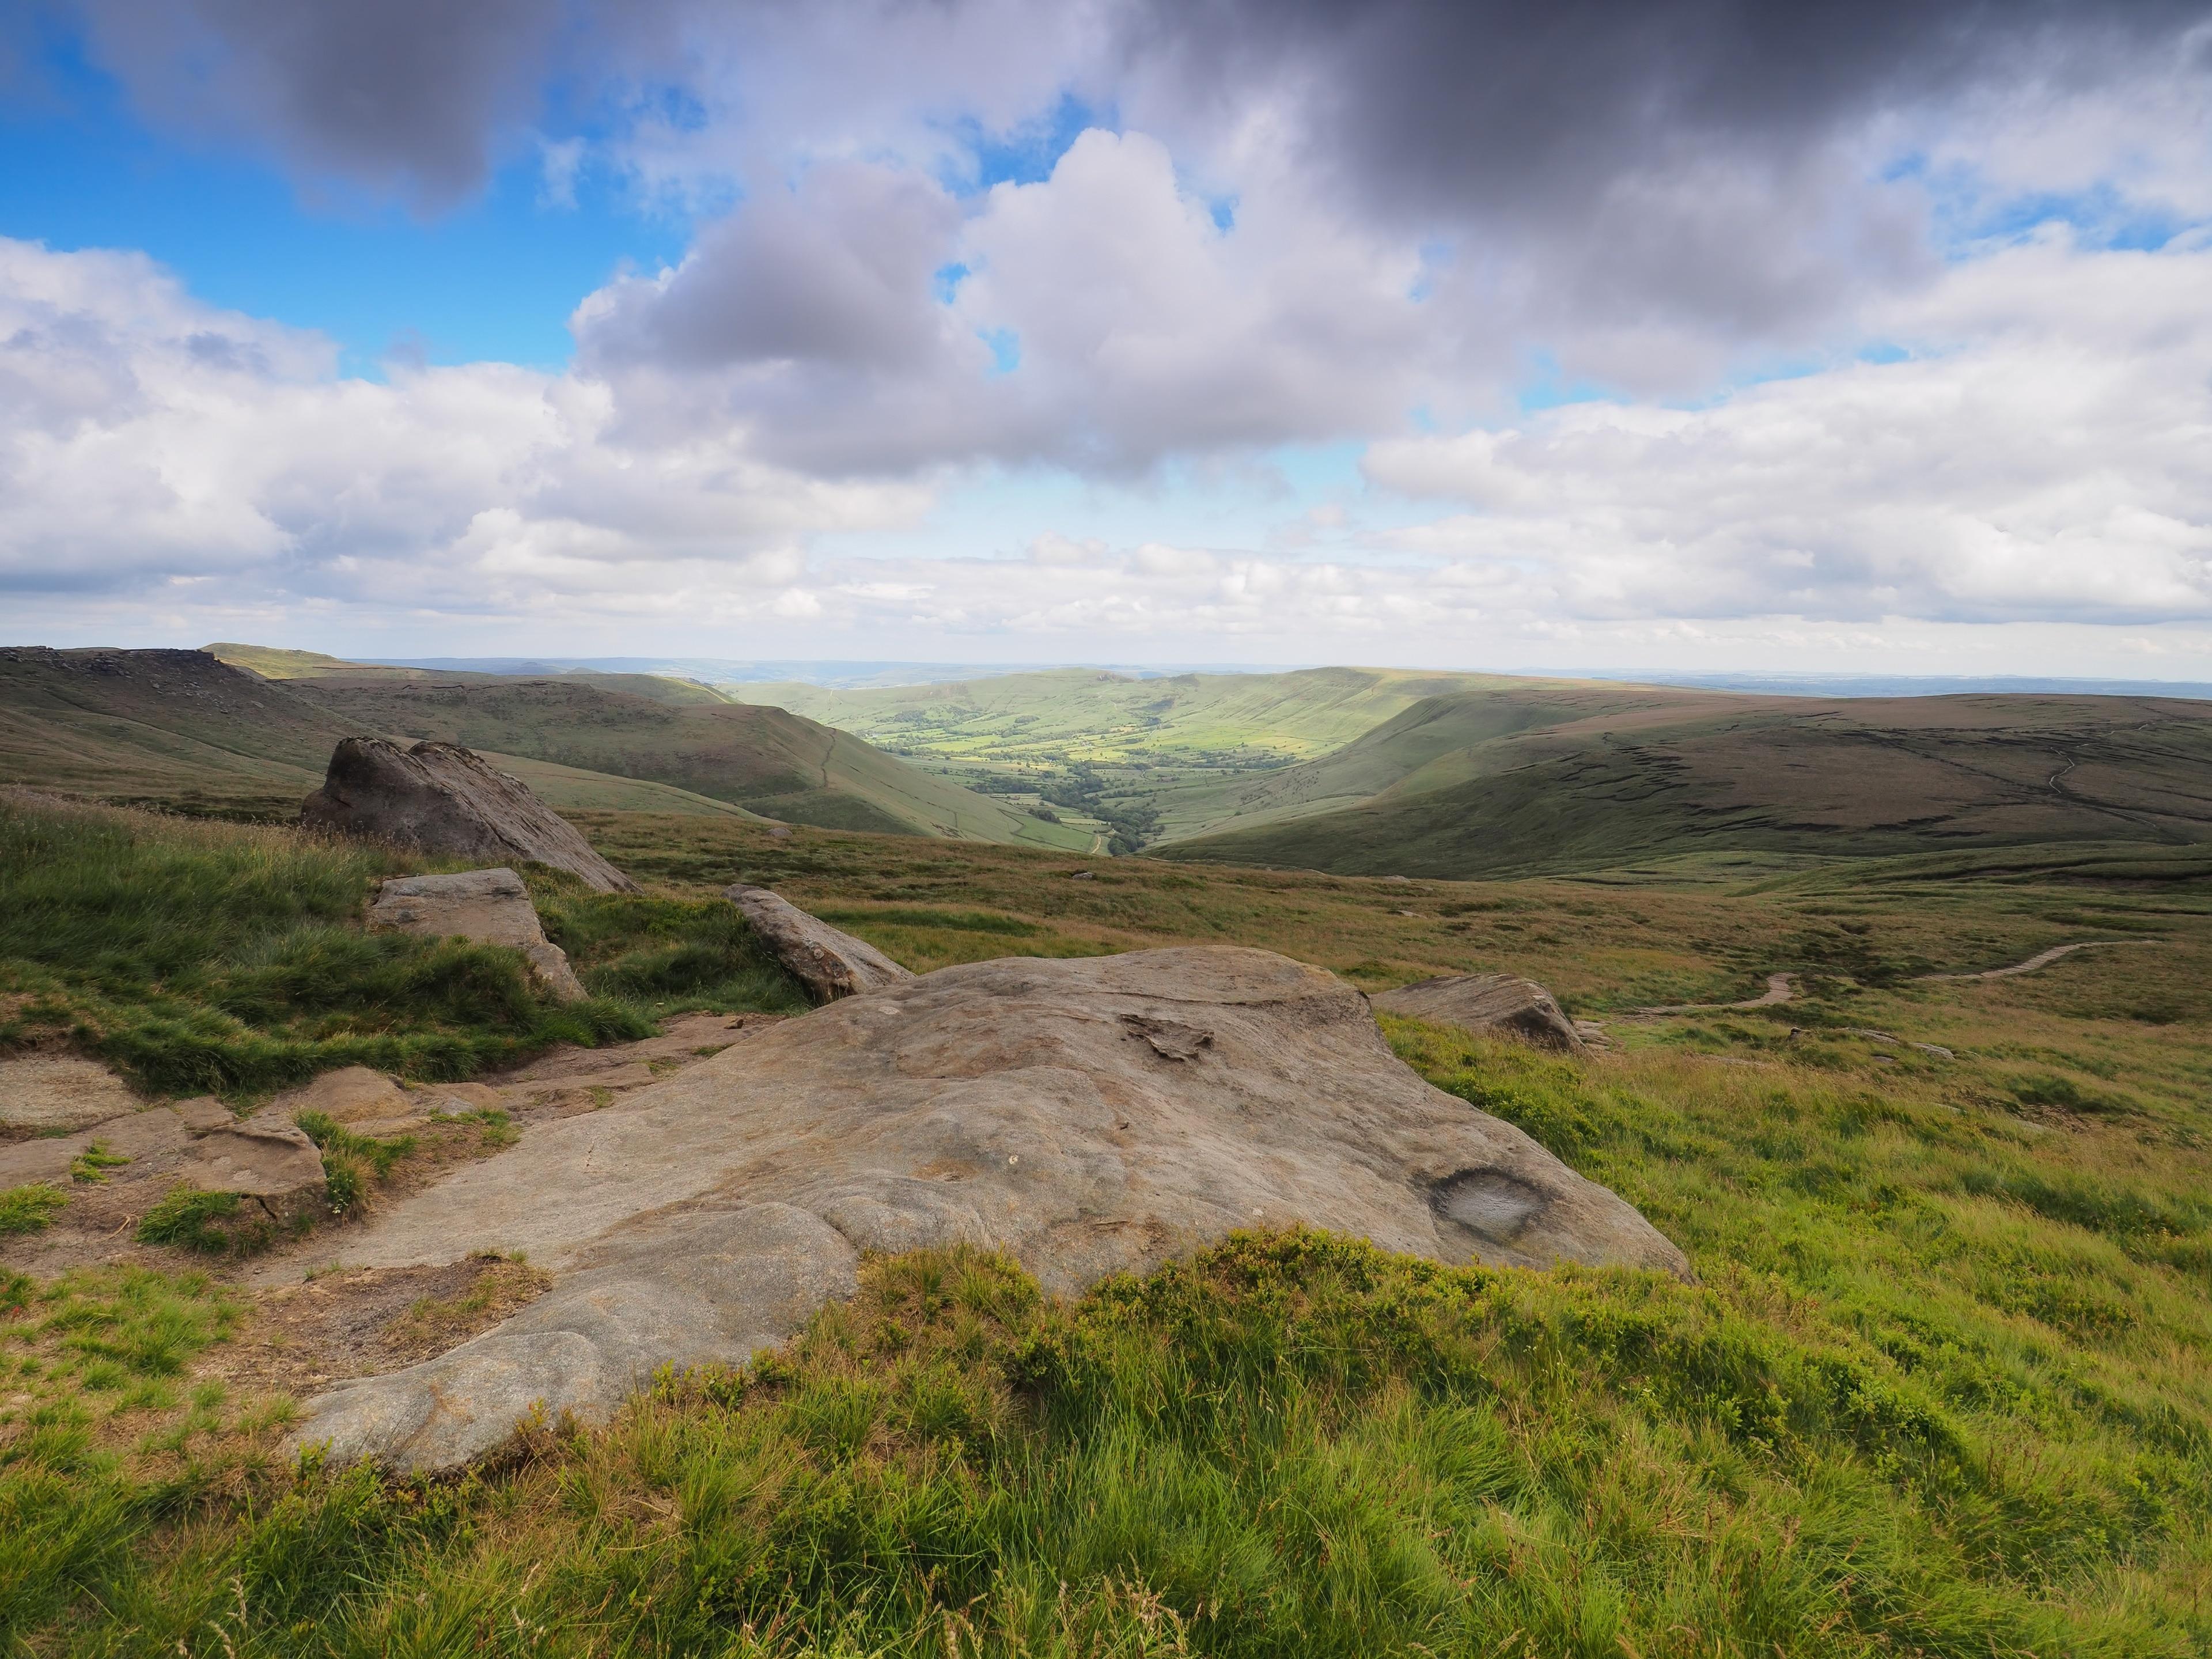 Edale, Hope Valley, England, United Kingdom